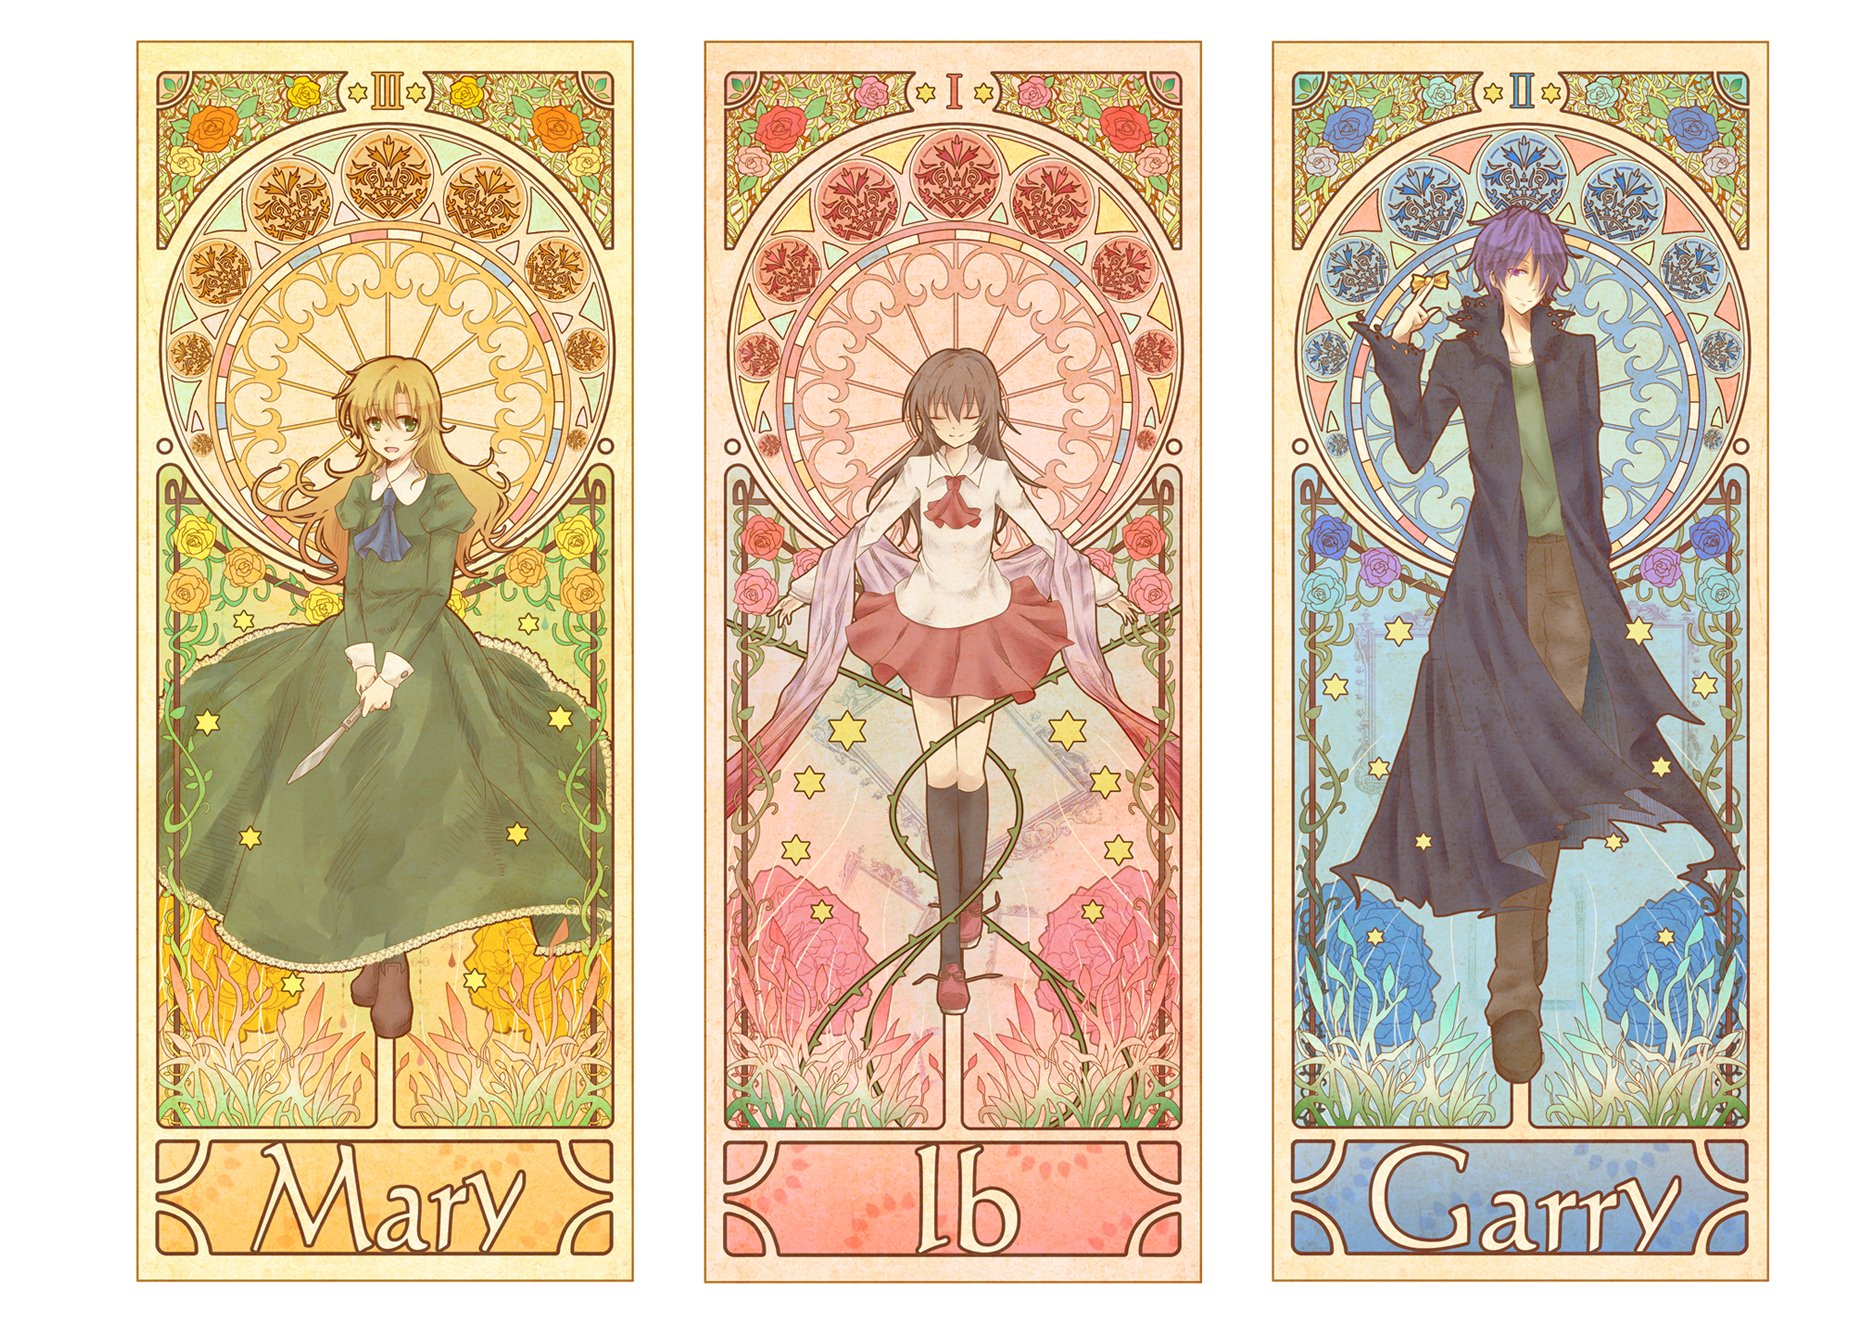 Mary wallpaper